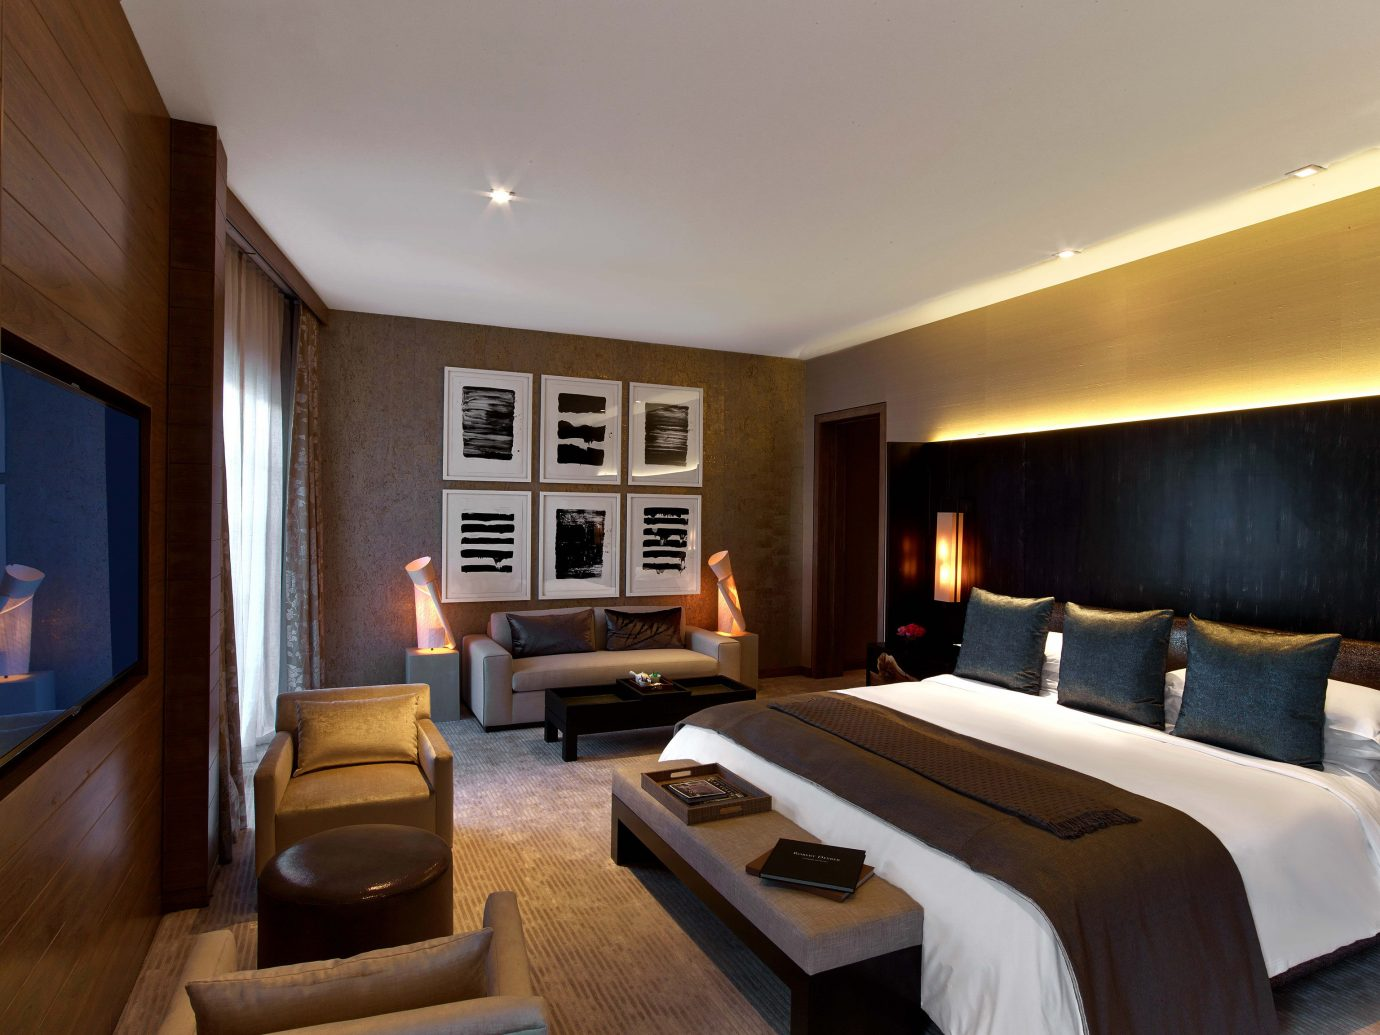 bedroom at The Nobu Villa suite at the Nobu Hotel in Las Vegas